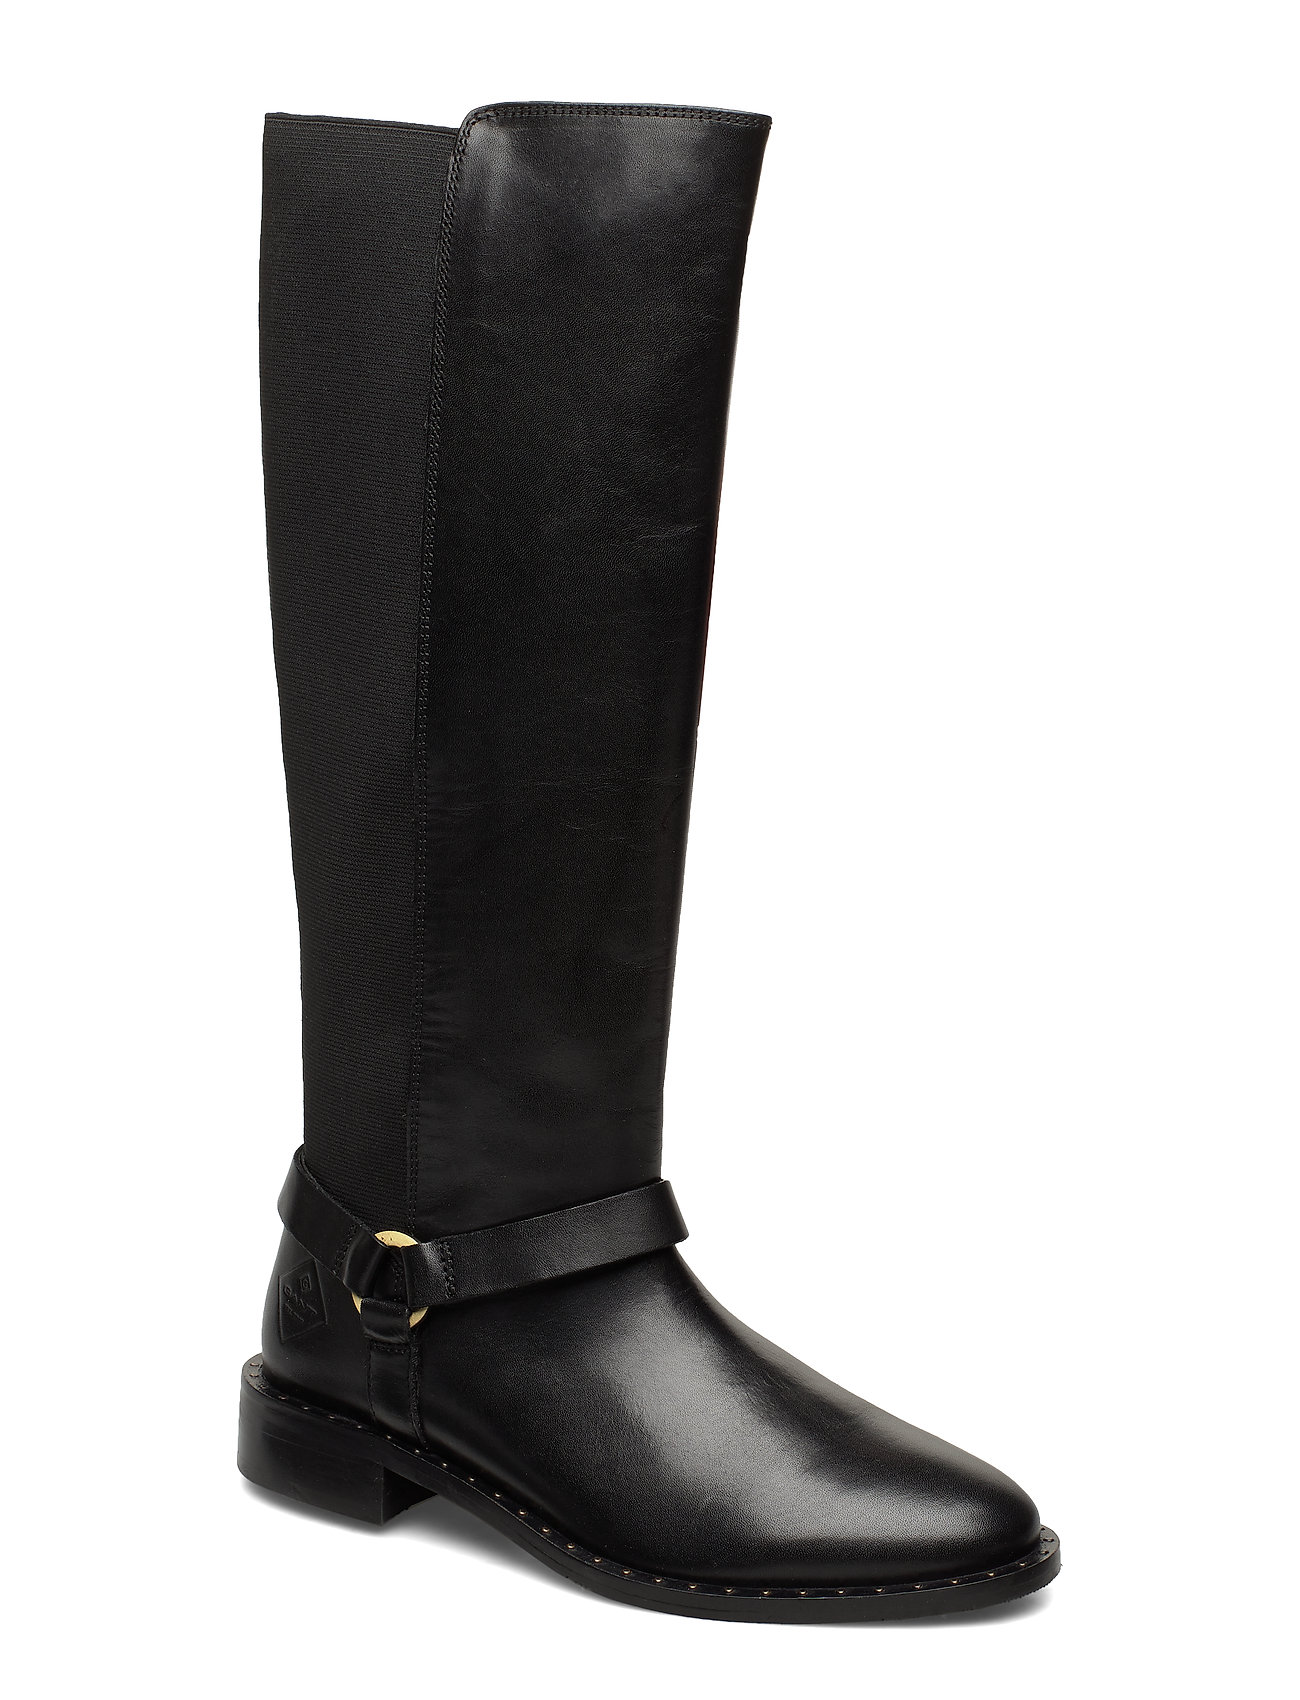 GANT Hampton Long shaft boot - BLACK